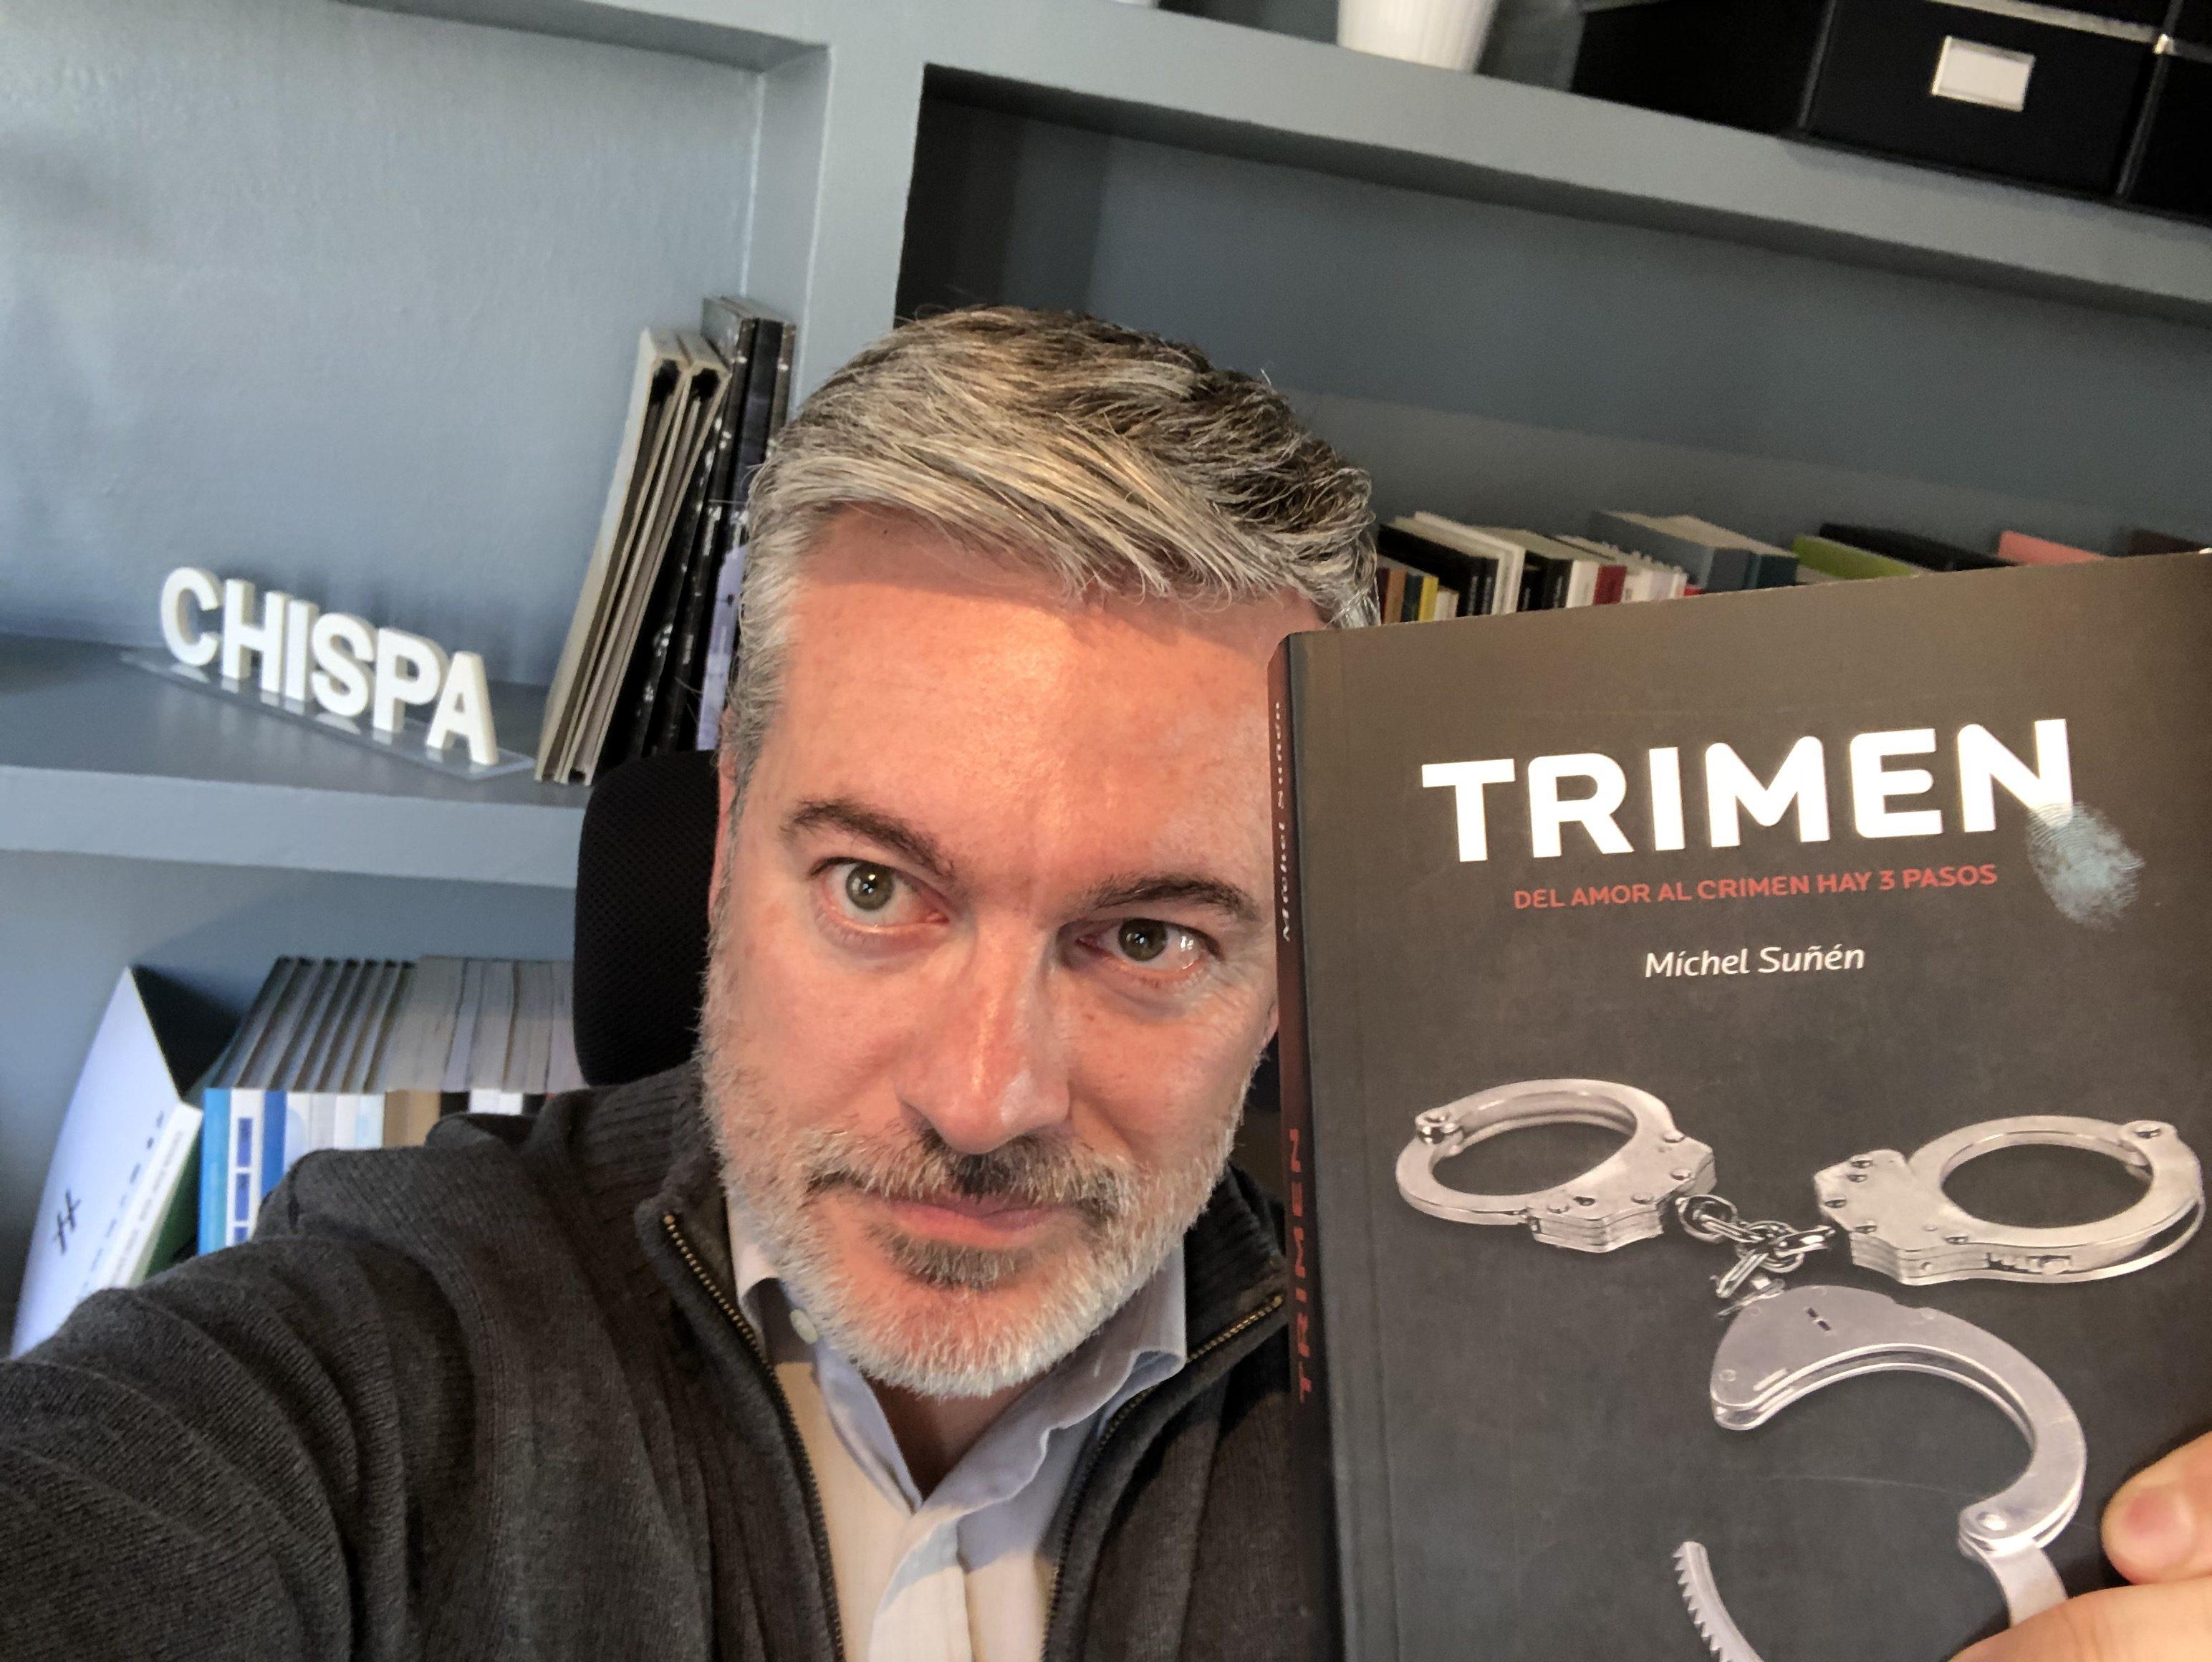 'Trimen', la nueva novela de Míchel Suñén